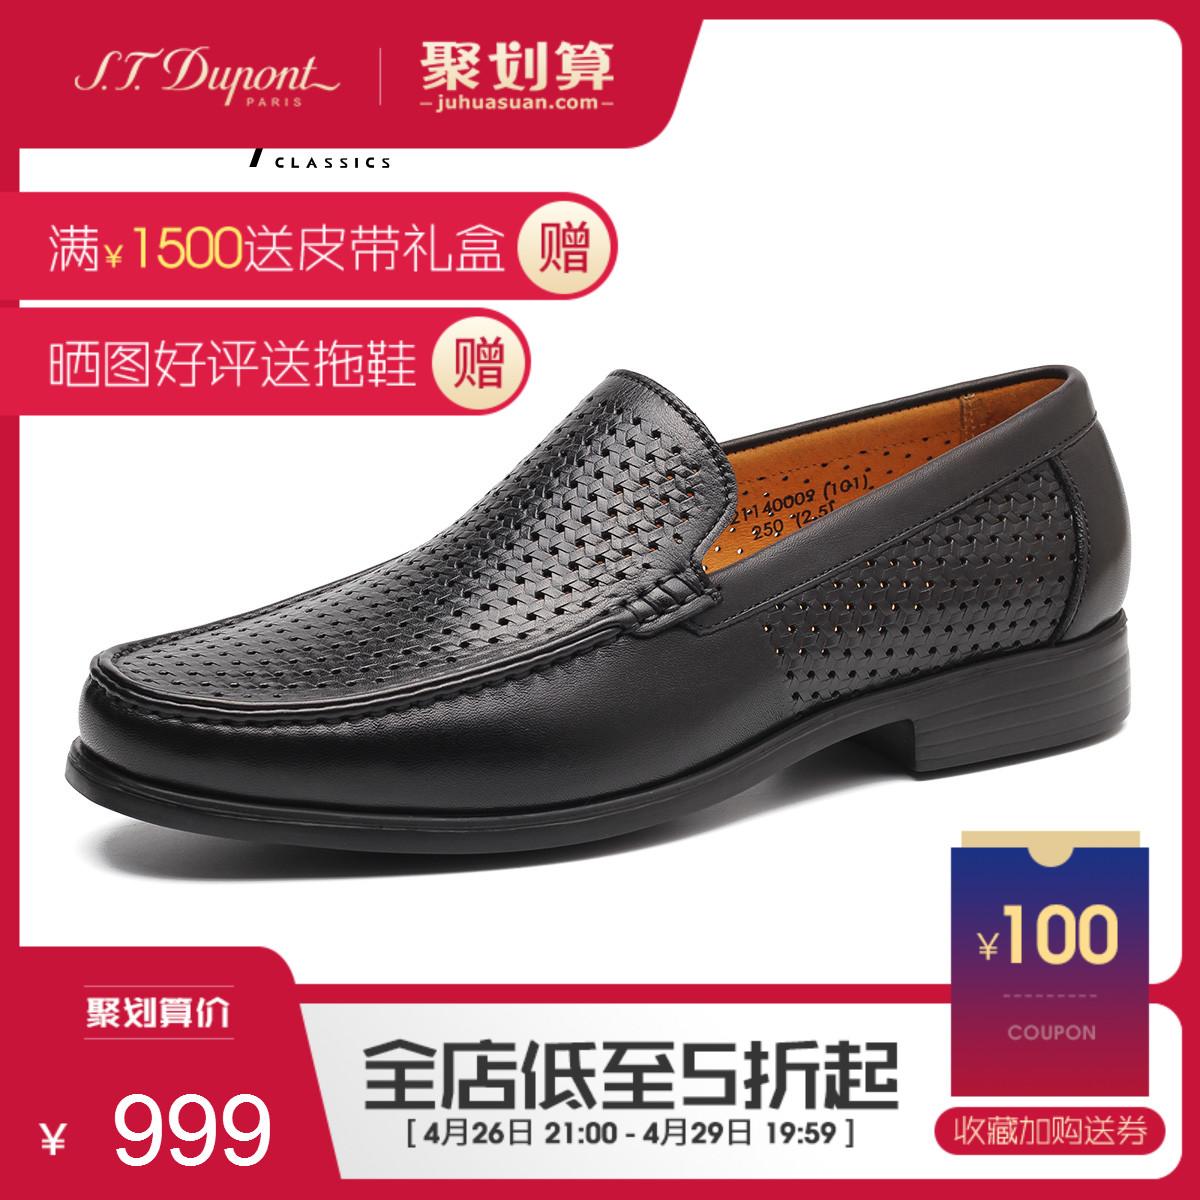 S.T. Dupont/都彭鏤空透氣舒適皮鞋套腳休閑商務男鞋G21140009